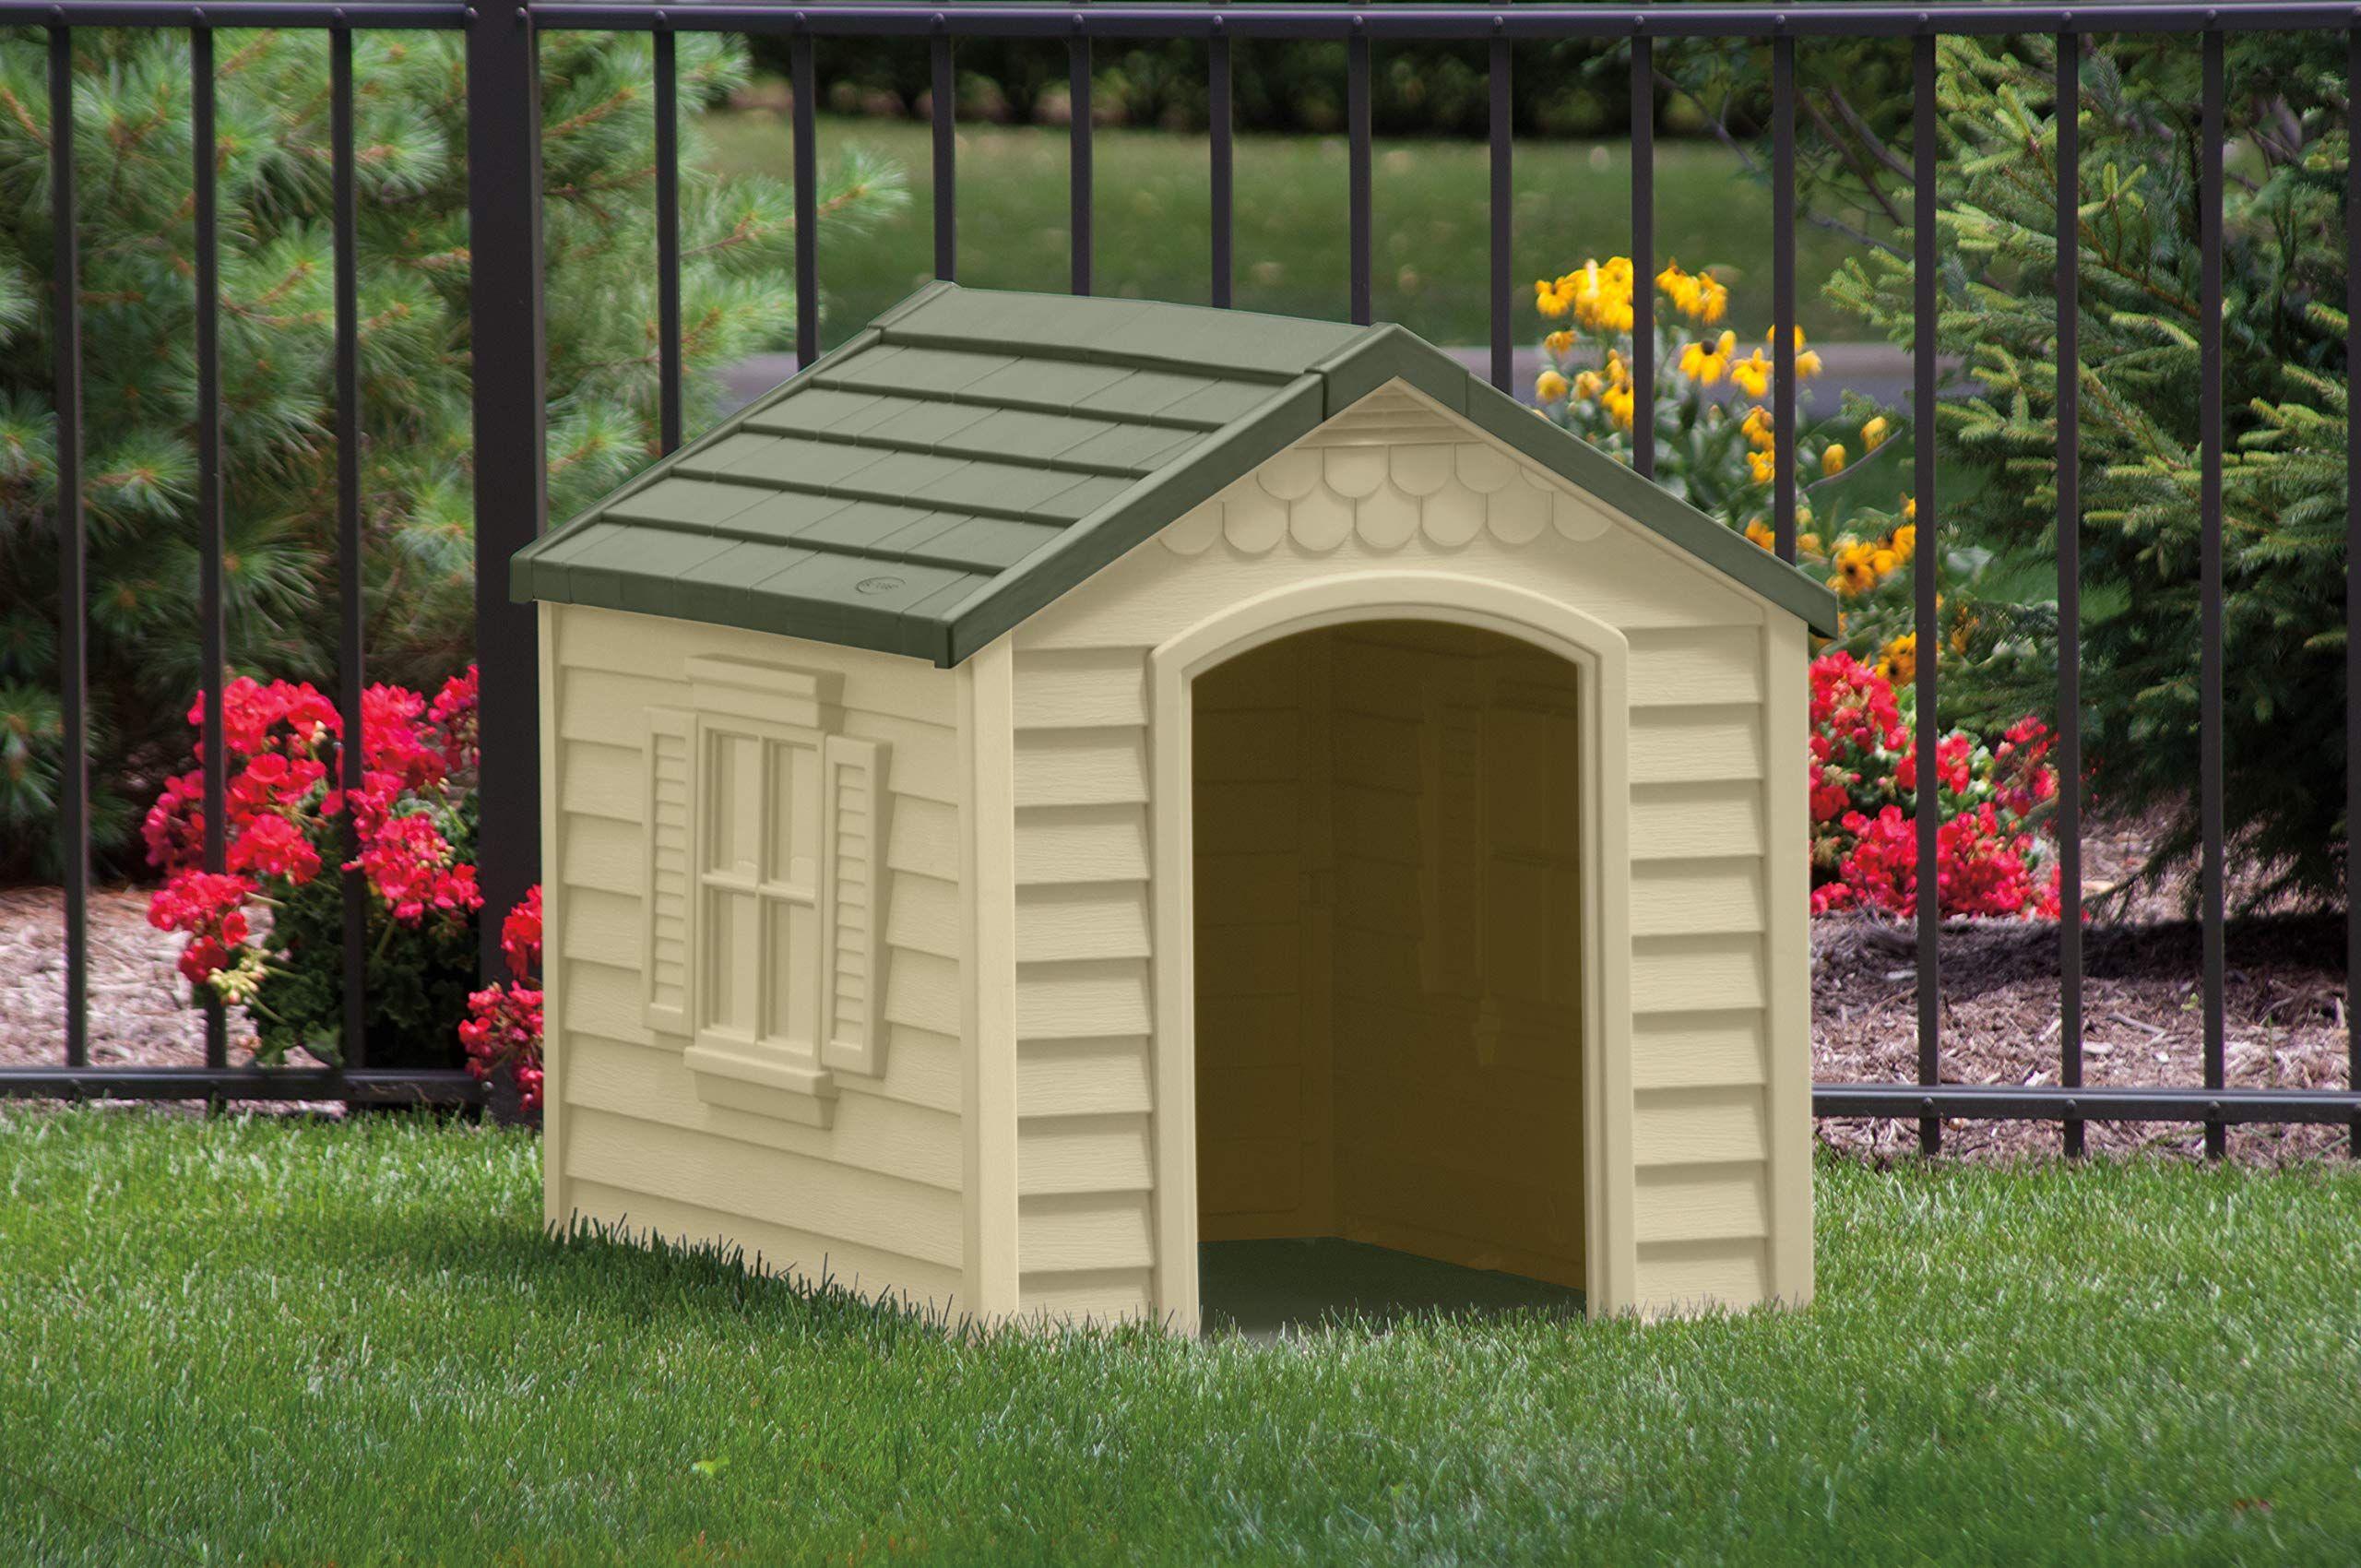 Suncast Outdoor Dog House With Door Water Resistant Dog House